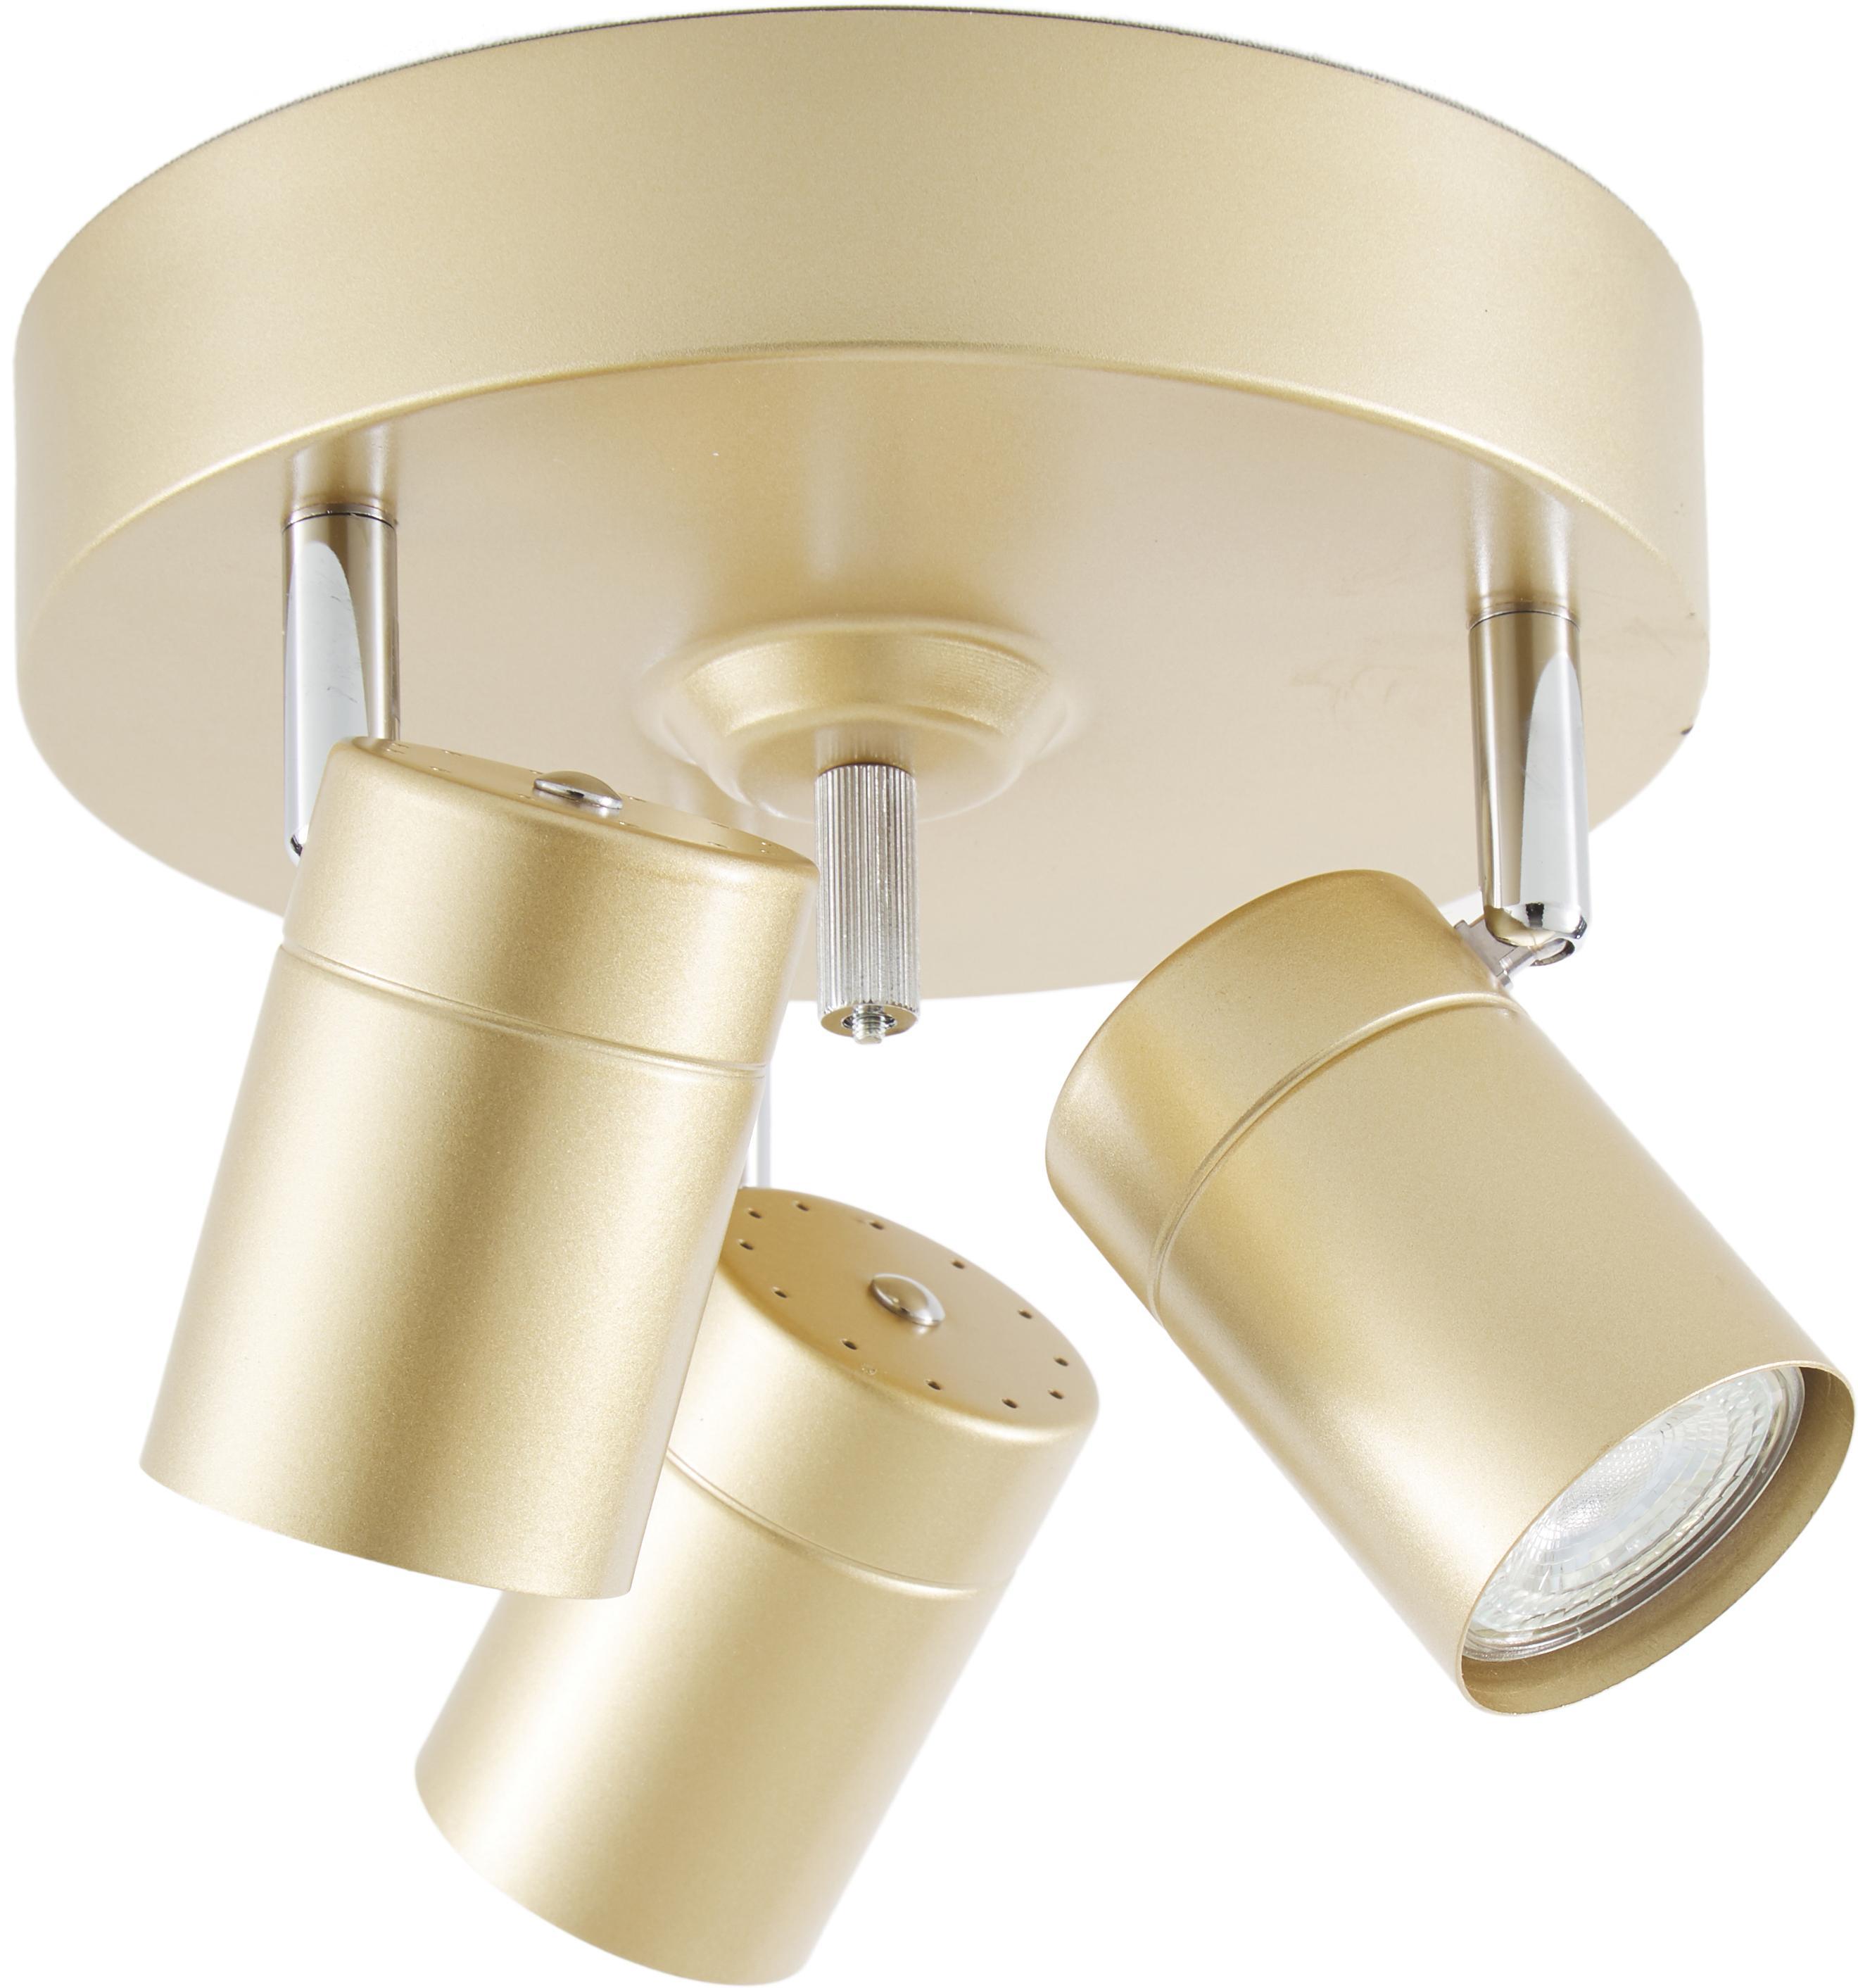 Plafondspot Correct, Lampenkap: gecoat metaal, Frame: gecoat metaal, Baldakijn: gecoat metaal, Goudkleurig, Ø 20 x H 14 cm